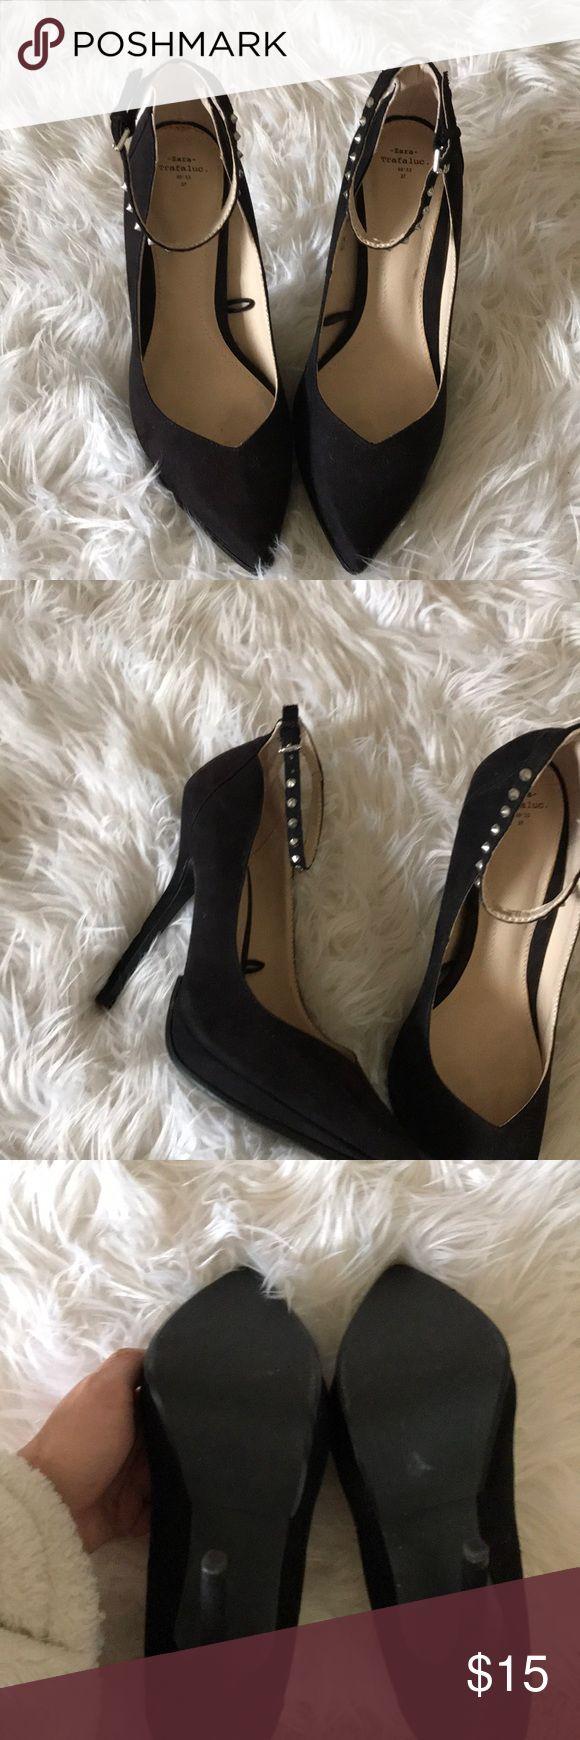 Zara suede studded ankle tie heels Zara suede pointed toe heels! Has studded ankle straps, size 37 UK or 7 US, great heel height, NEVER WORN (my feet were too wide) Zara Shoes Heels